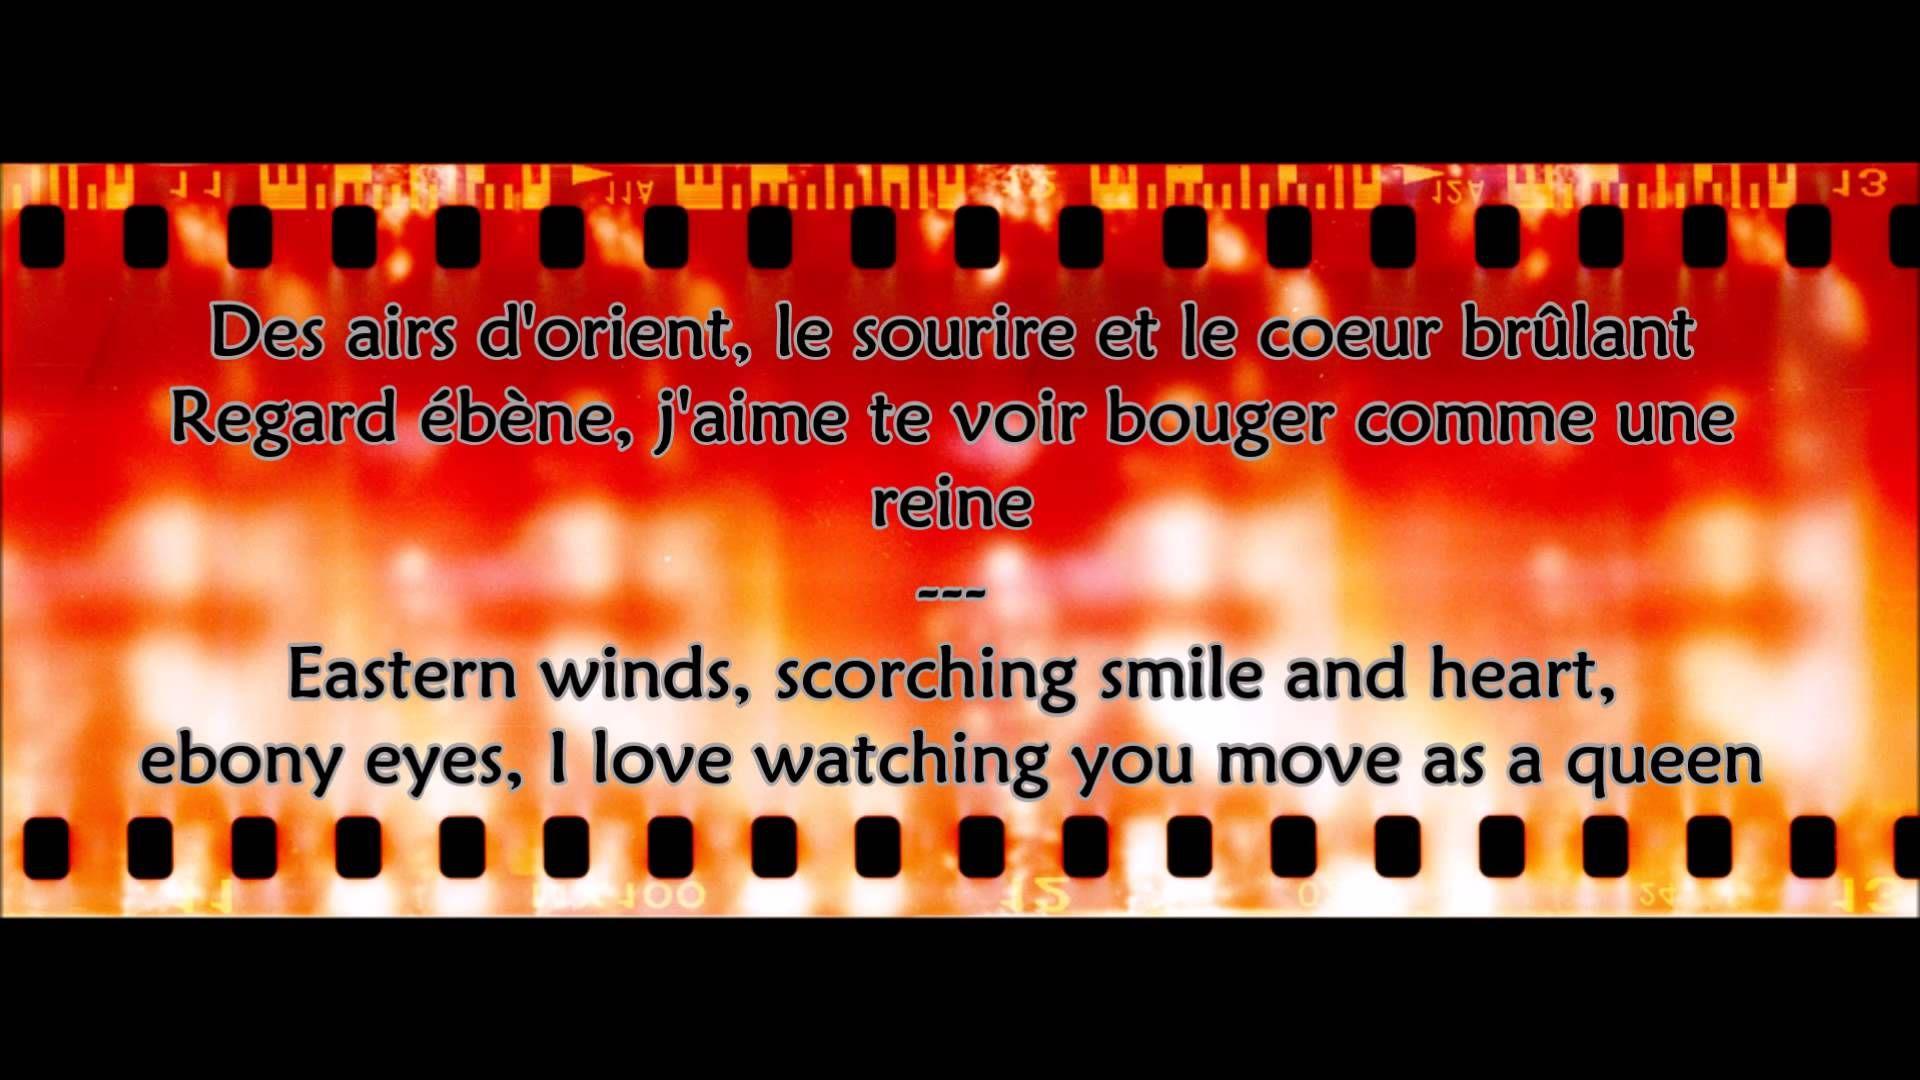 Kendji Girac Andalouse Lyrics And English Translation English Translation Lyrics Greatest Songs